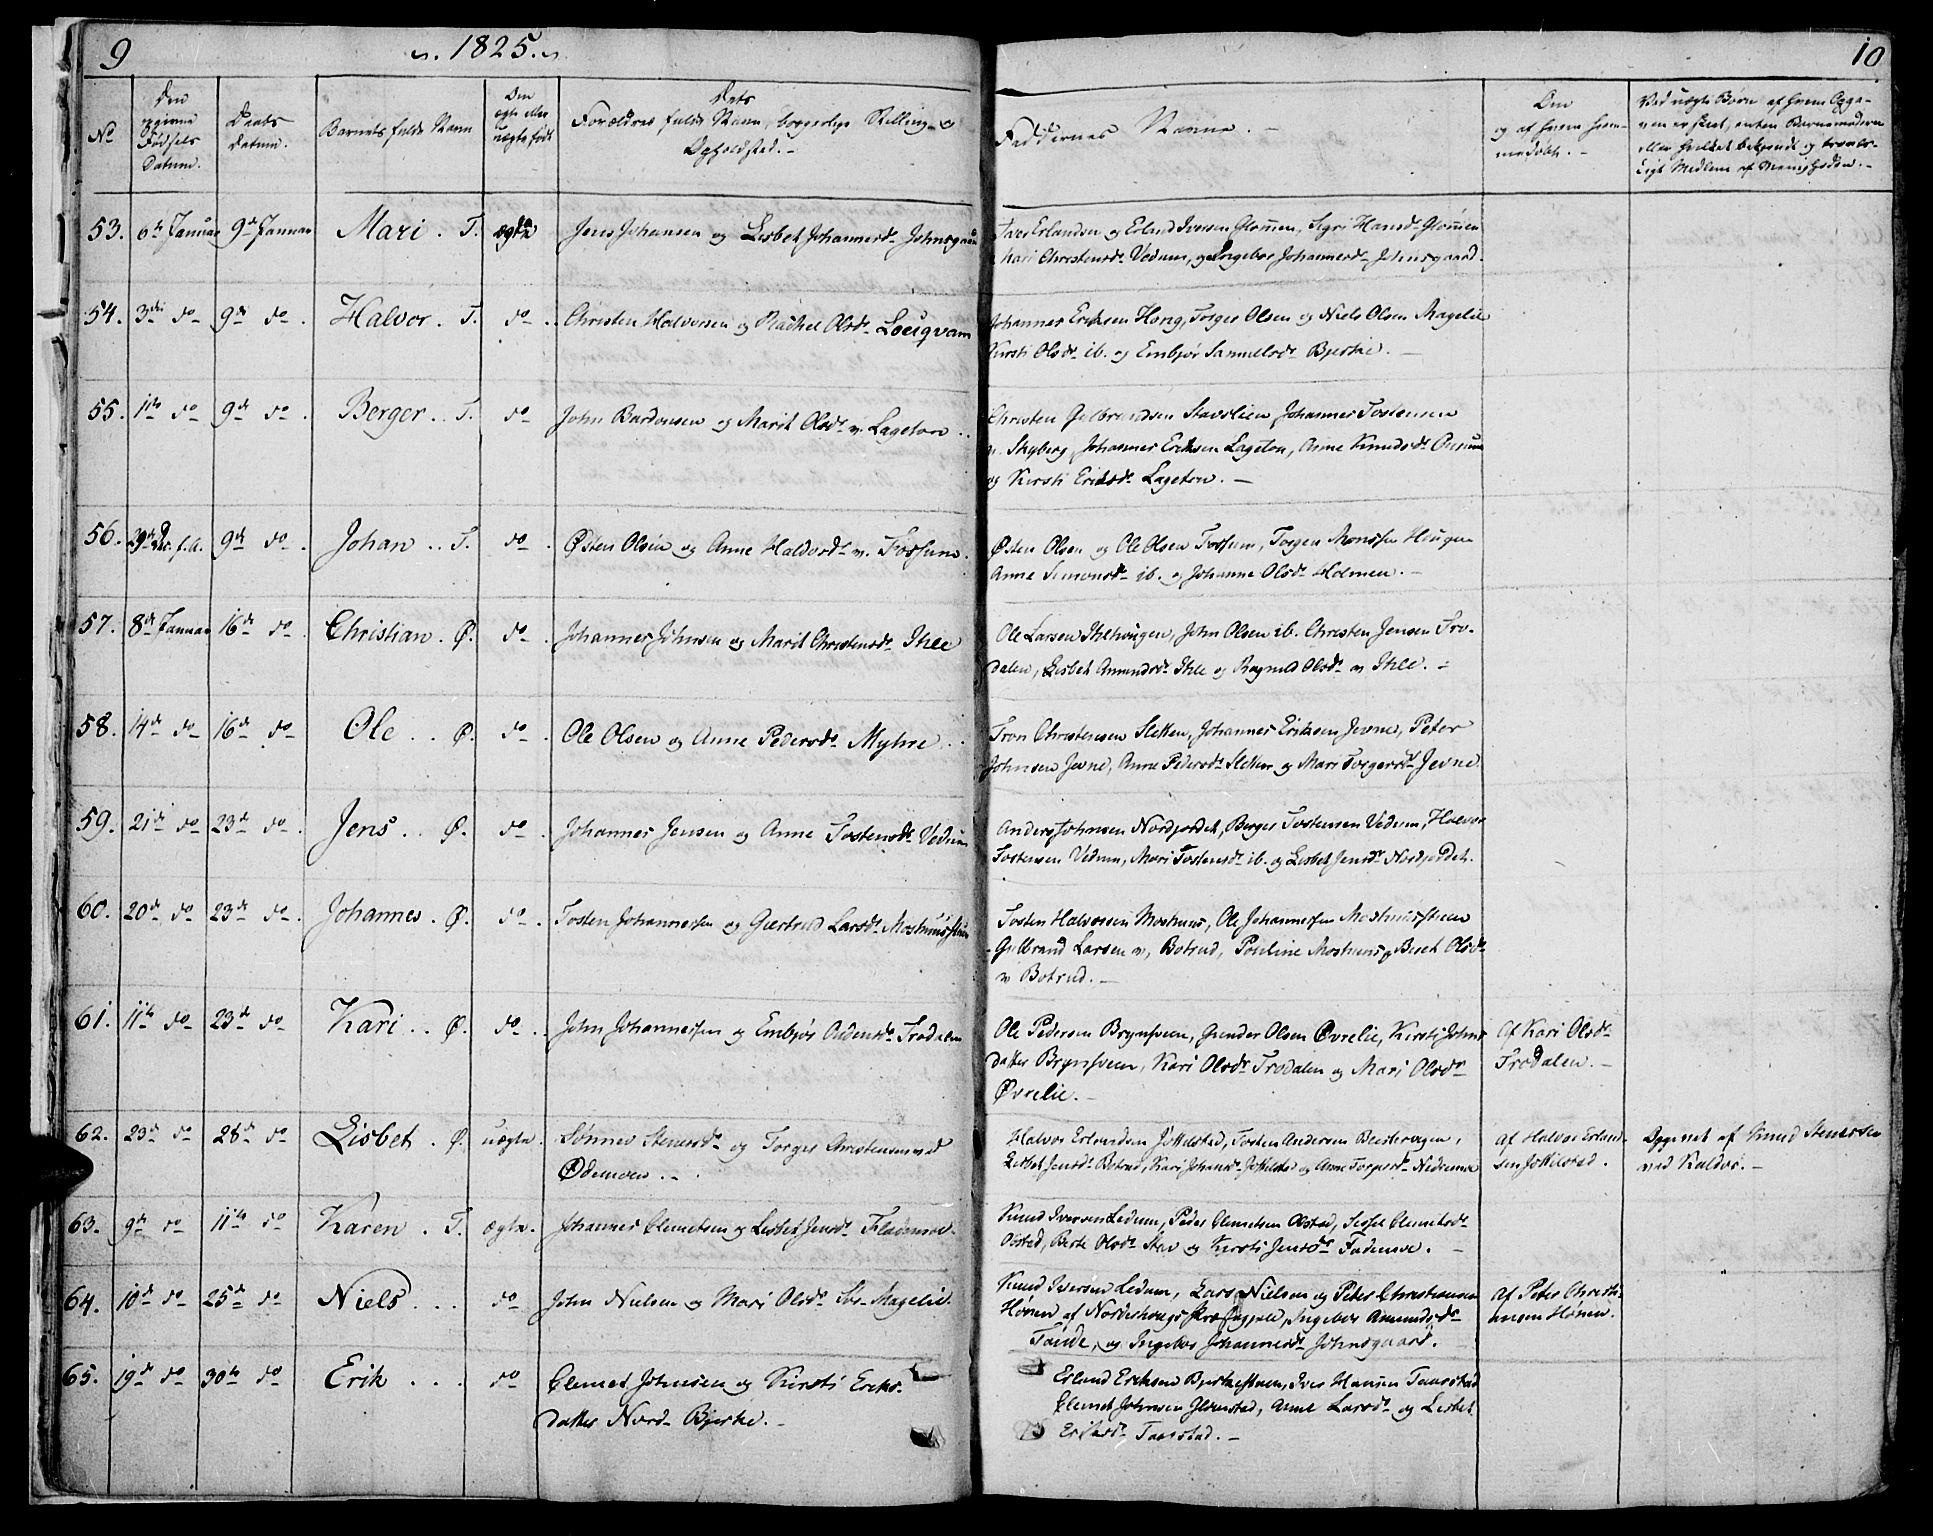 SAH, Øyer prestekontor, Ministerialbok nr. 4, 1824-1841, s. 9-10